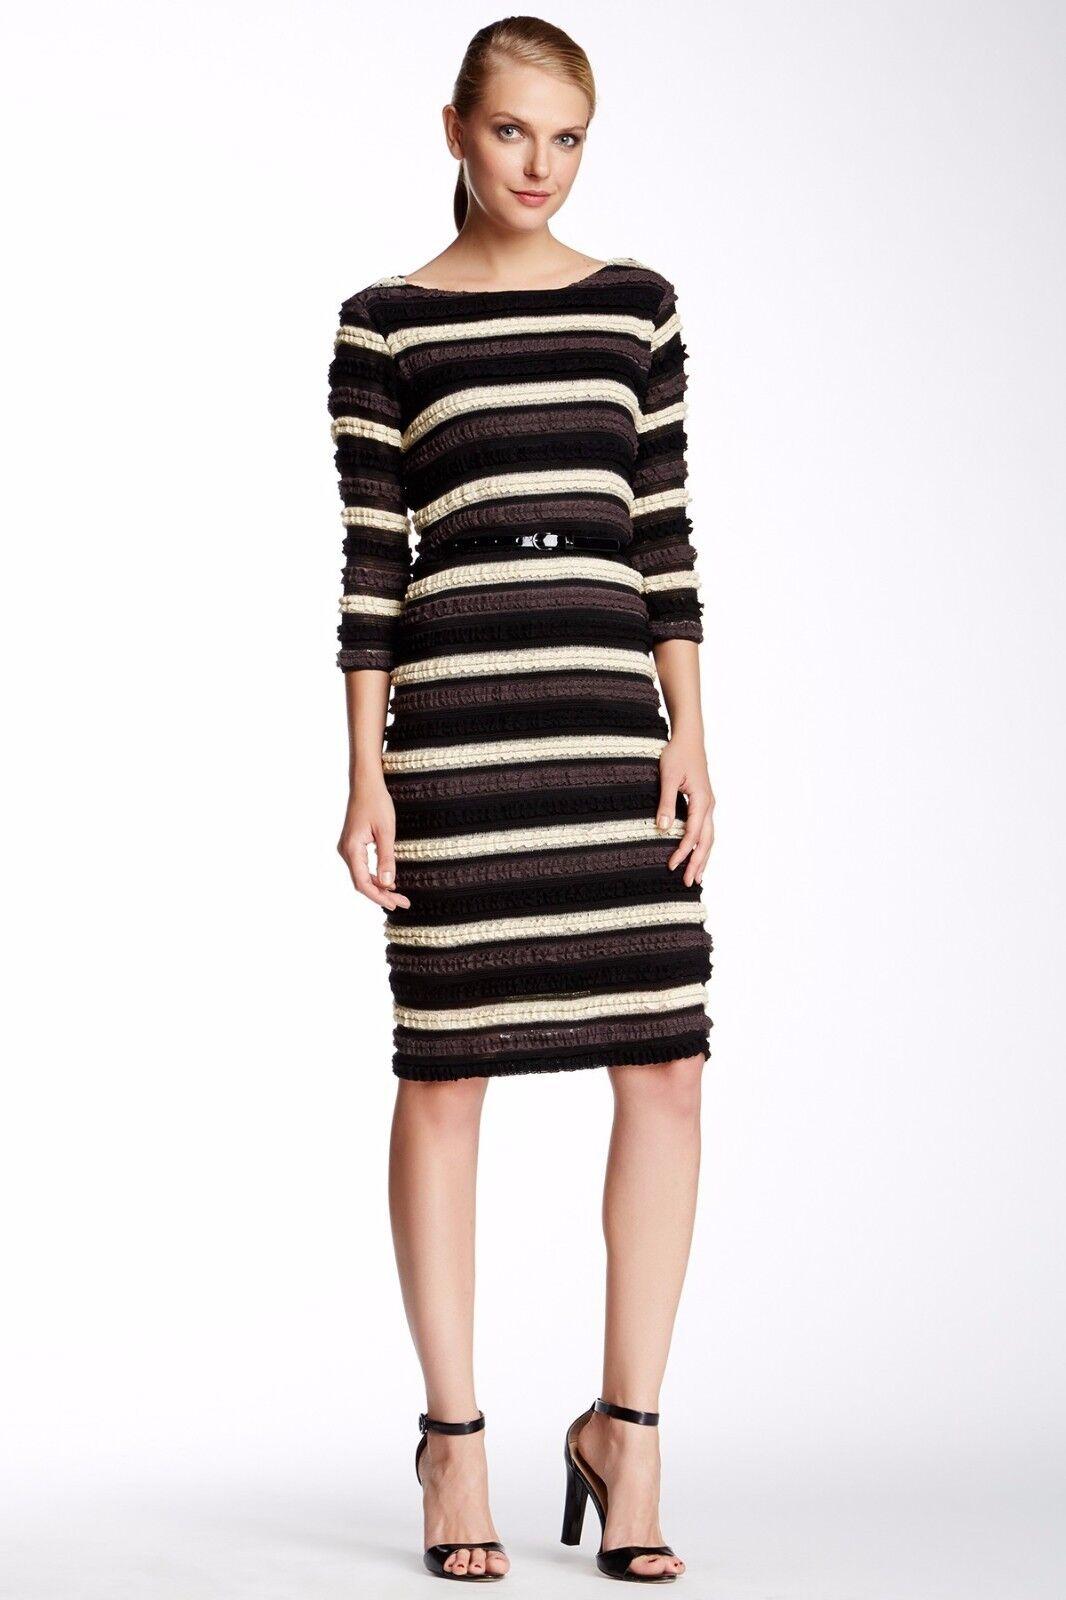 New Sharagano Women Stretch Knit Ruffled Dress Multi colorSize 10